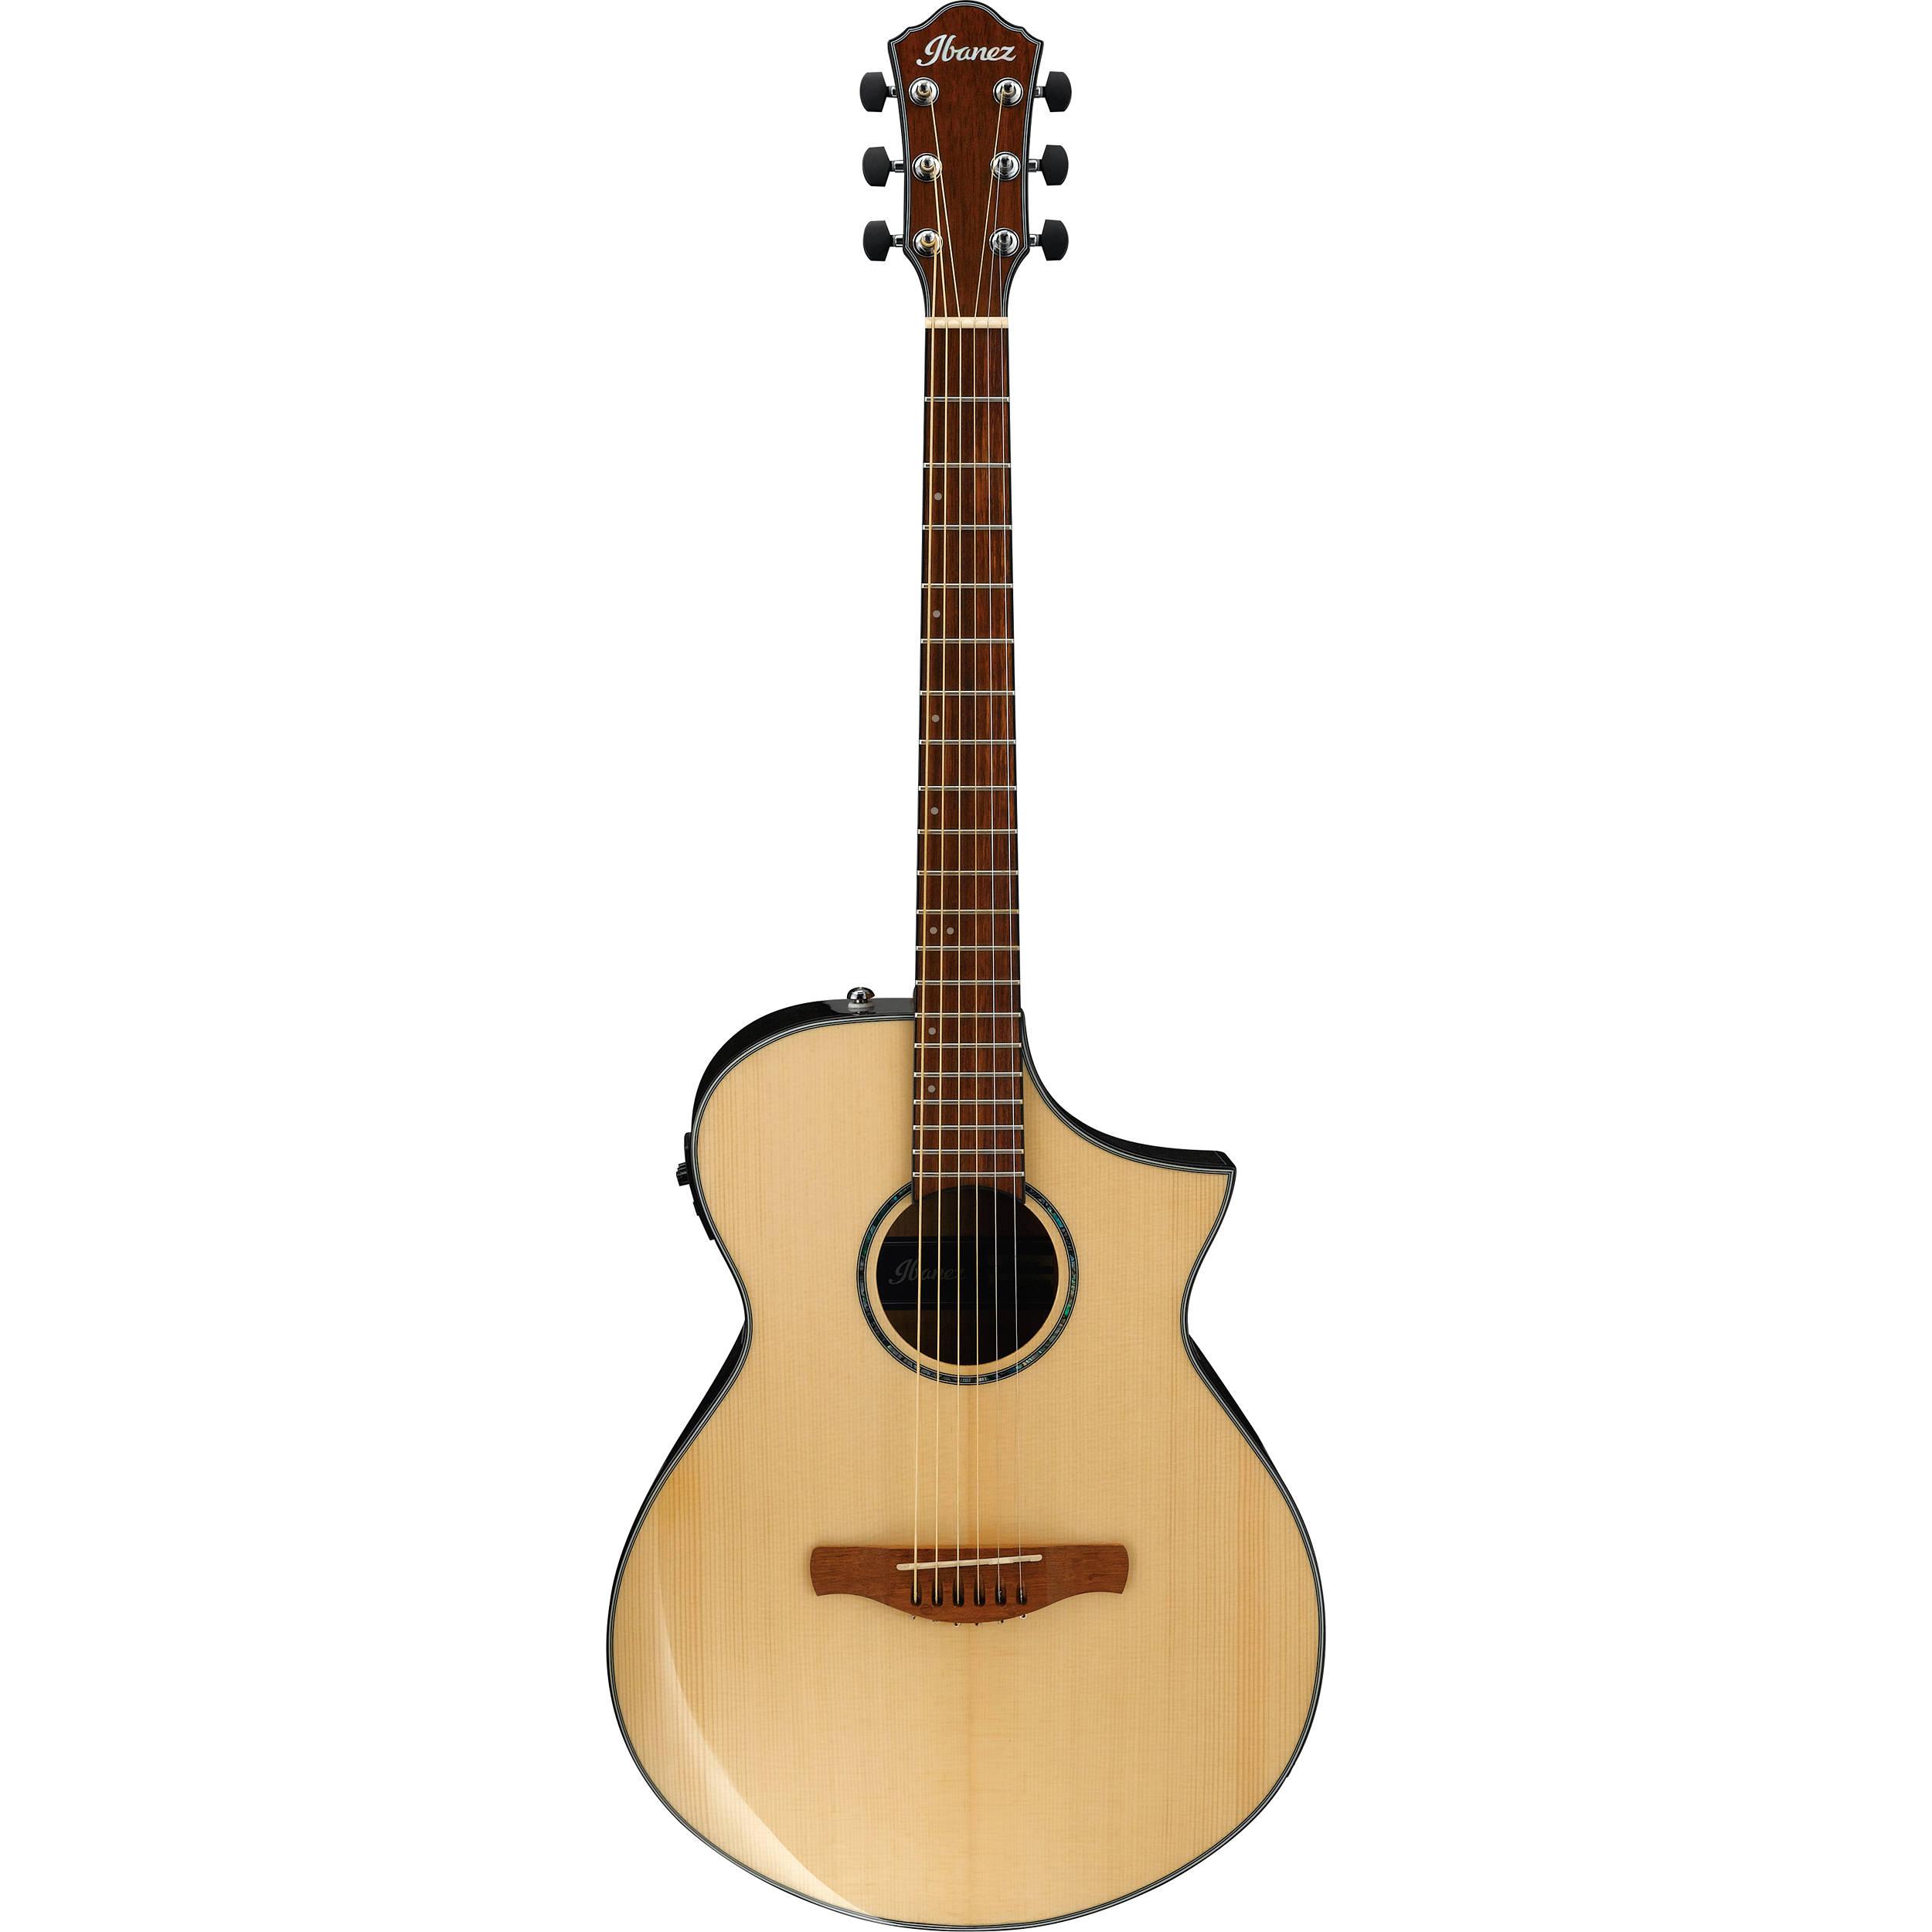 ibanez aewc300 aew series acoustic electric guitar aewc300nt b h. Black Bedroom Furniture Sets. Home Design Ideas